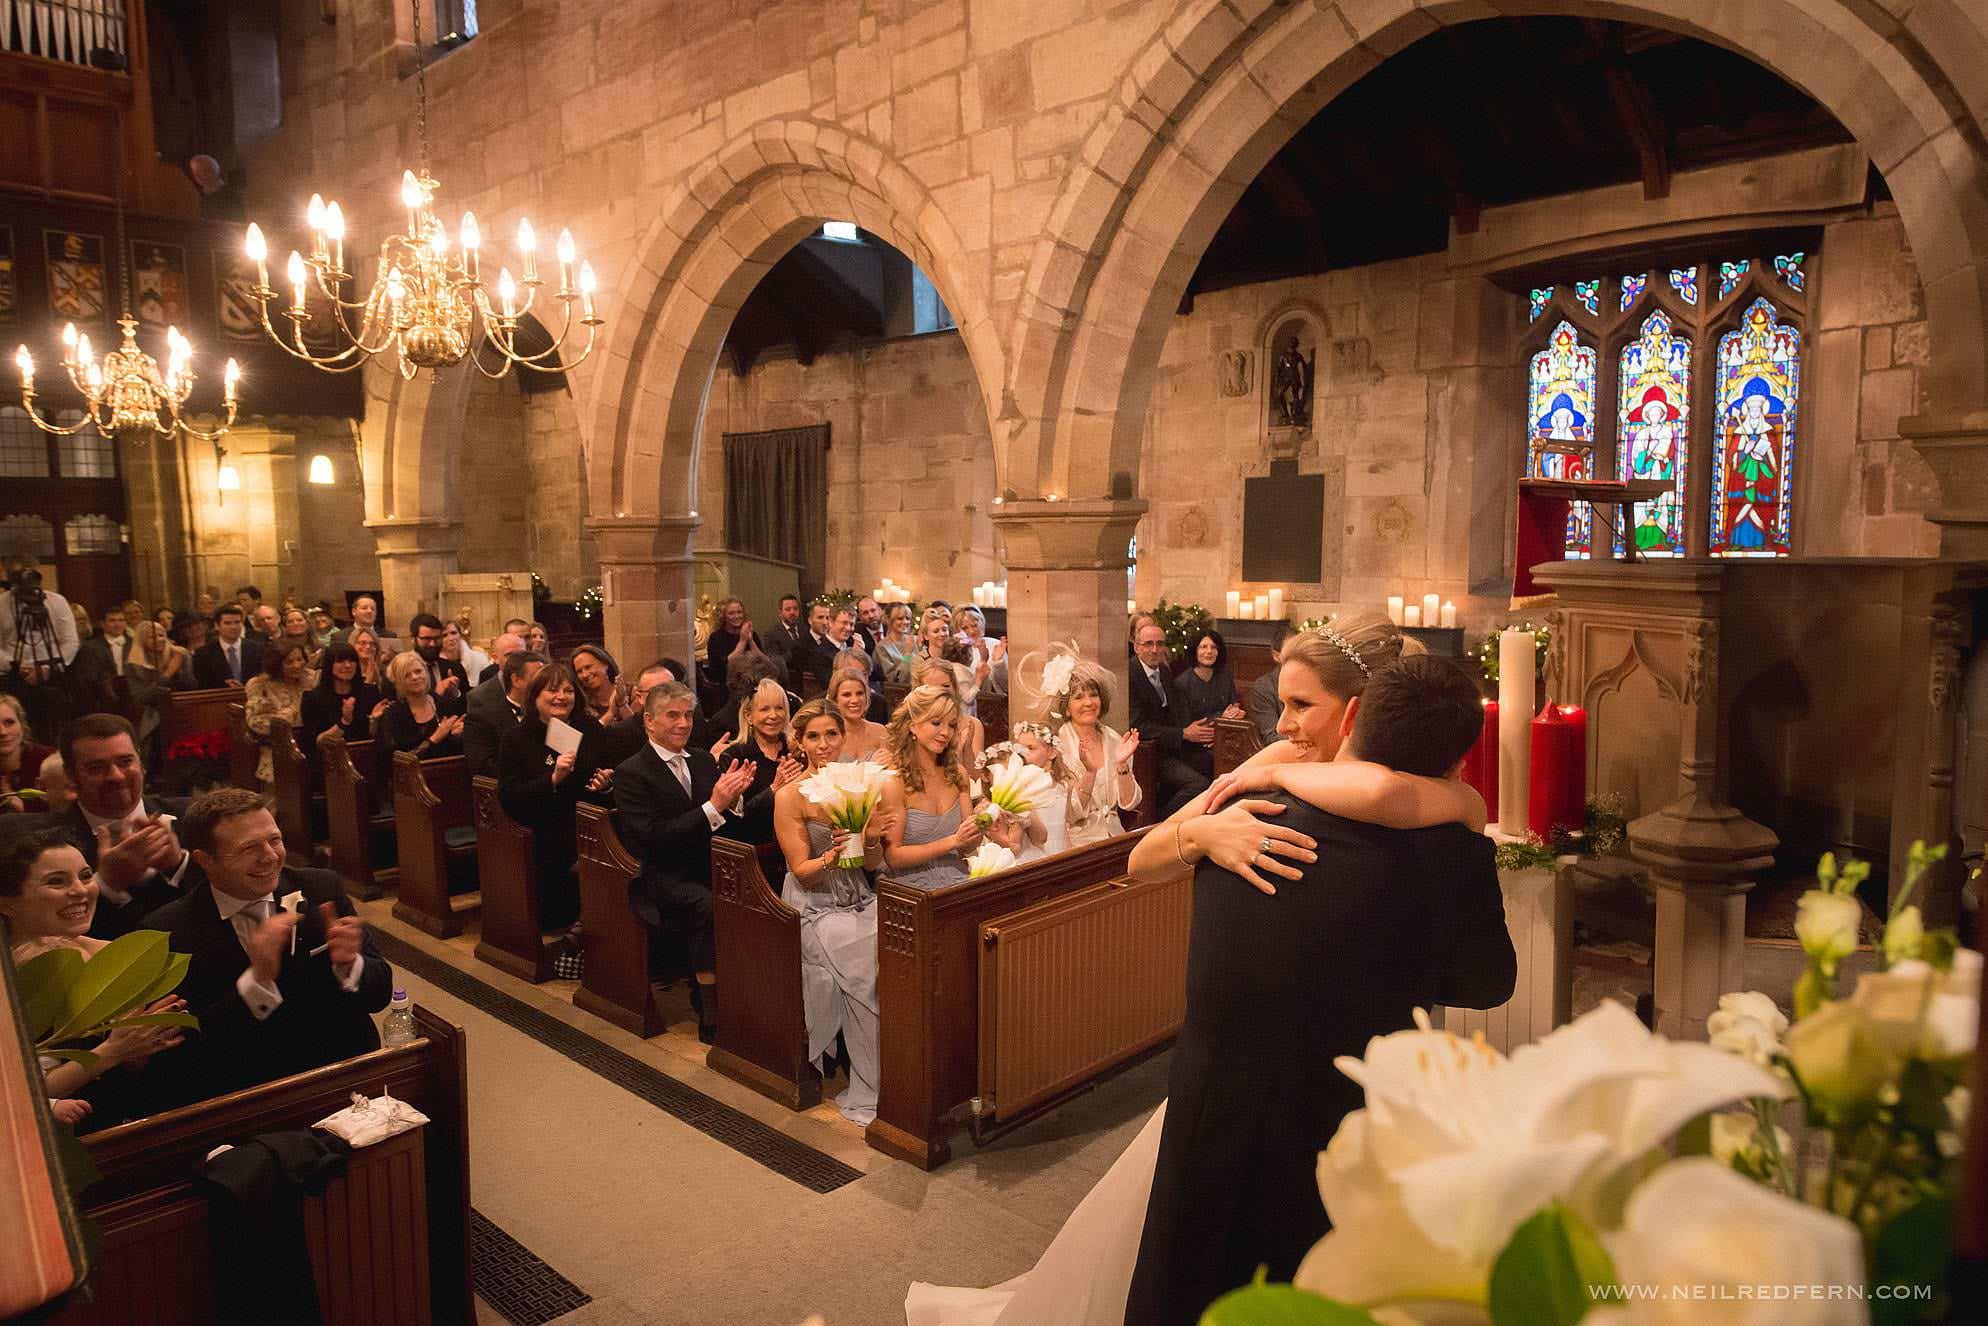 St Mary's Church Nether Alderley wedding 05